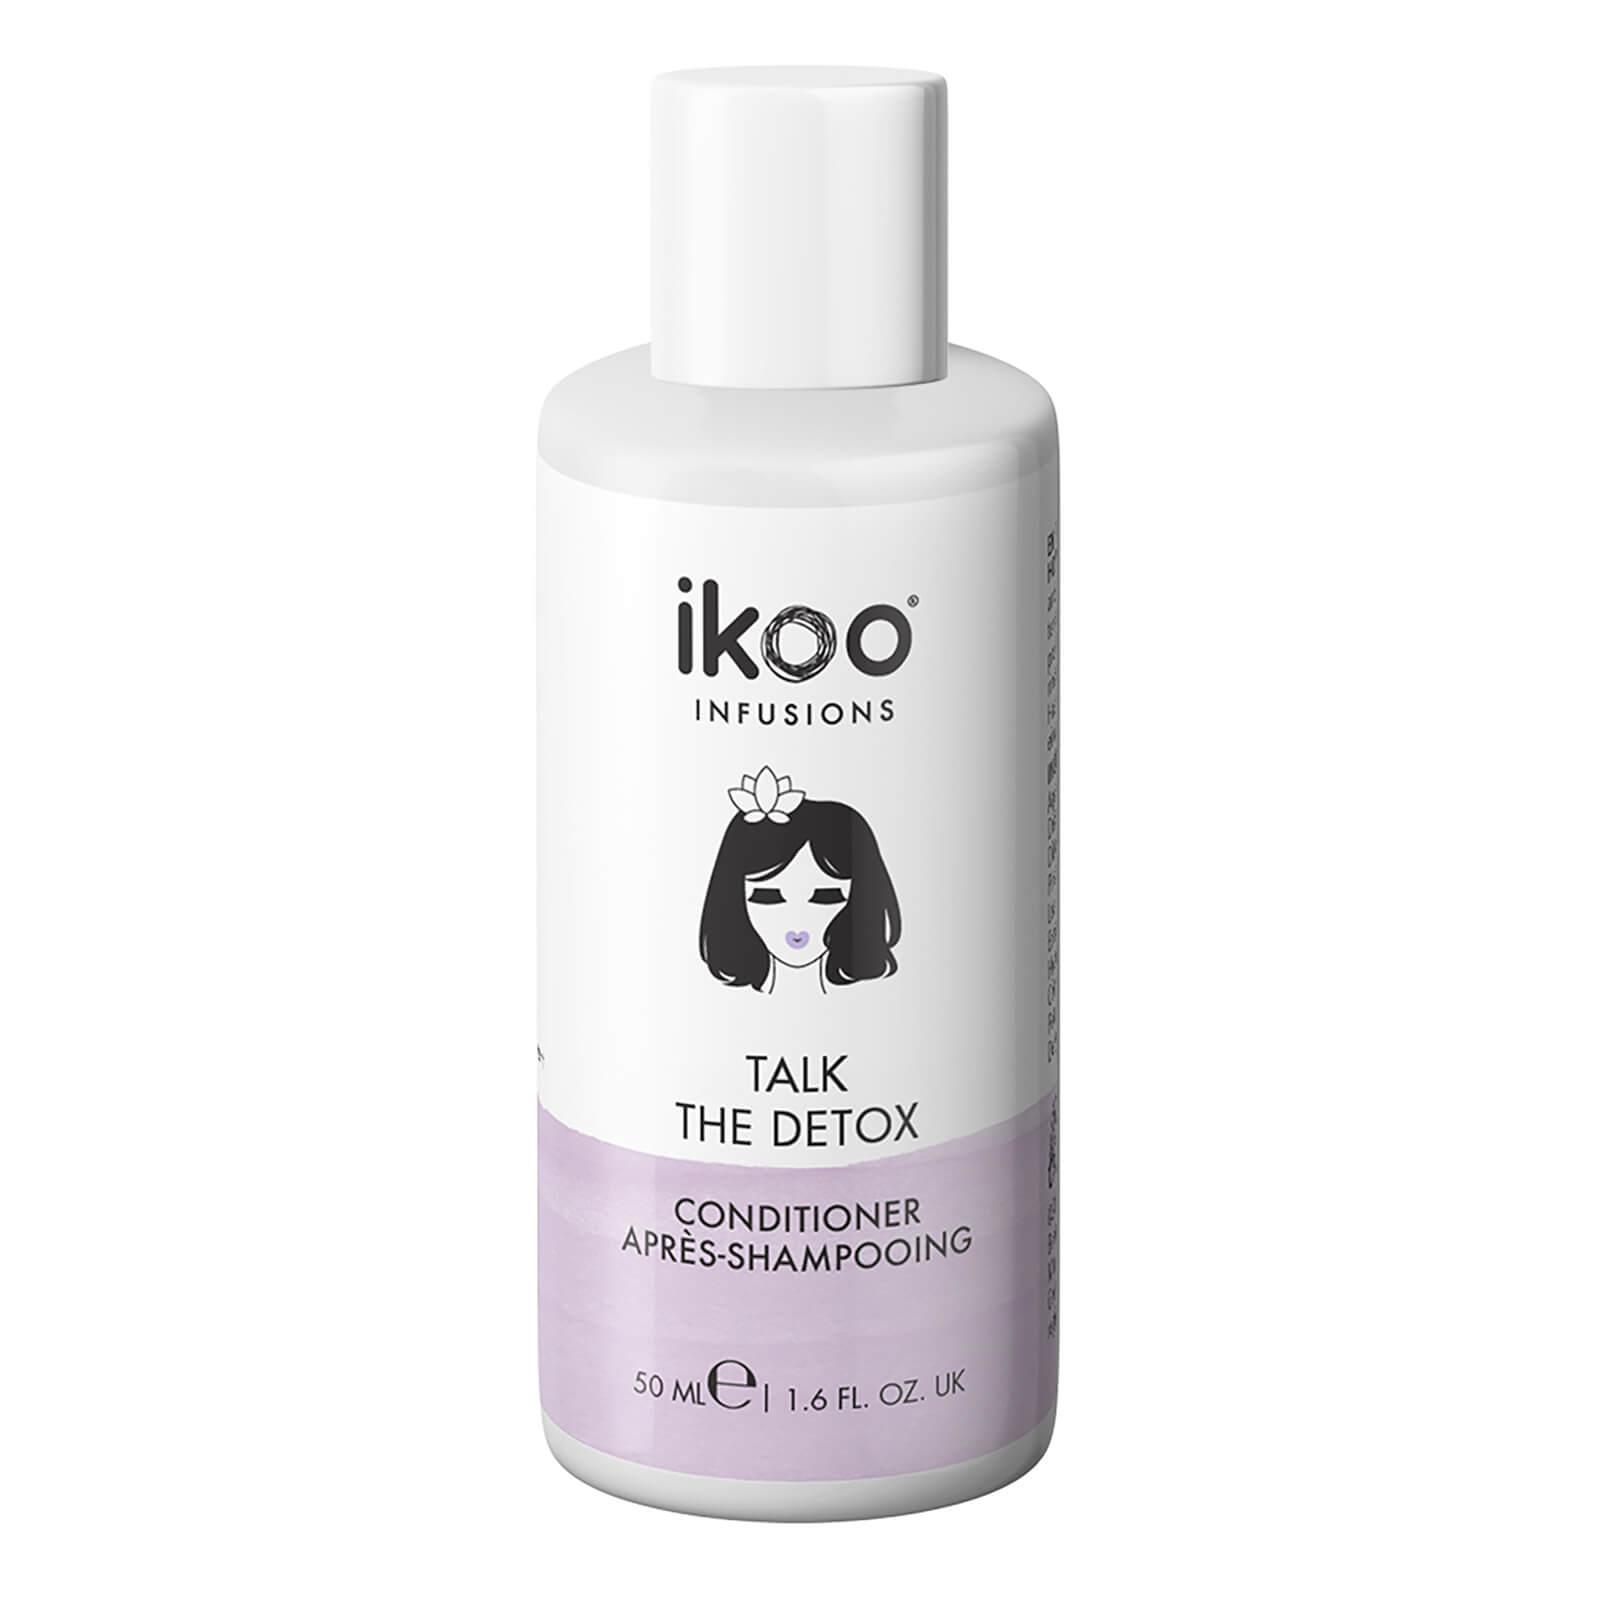 Купить Ikoo Conditioner - Talk the Detox 50ml